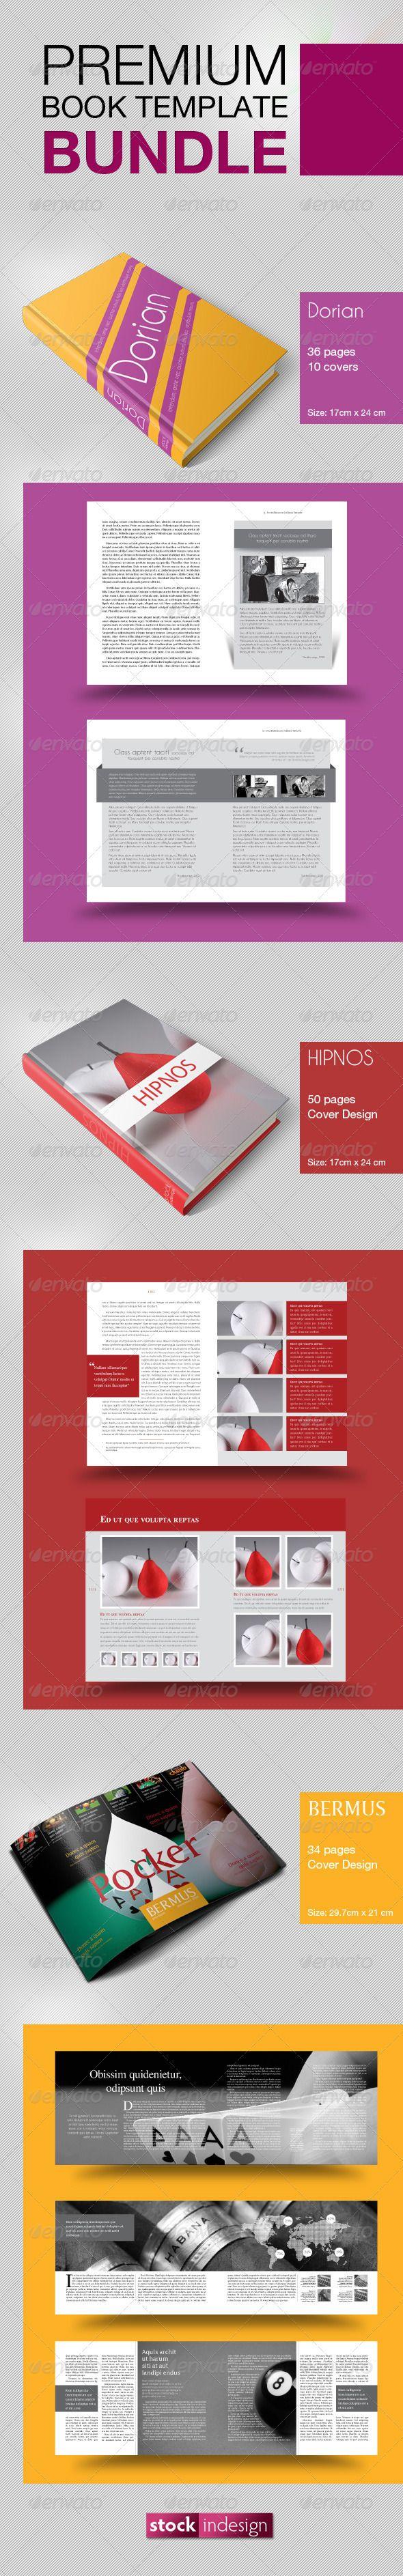 102 best print templates images on pinterest print templates font